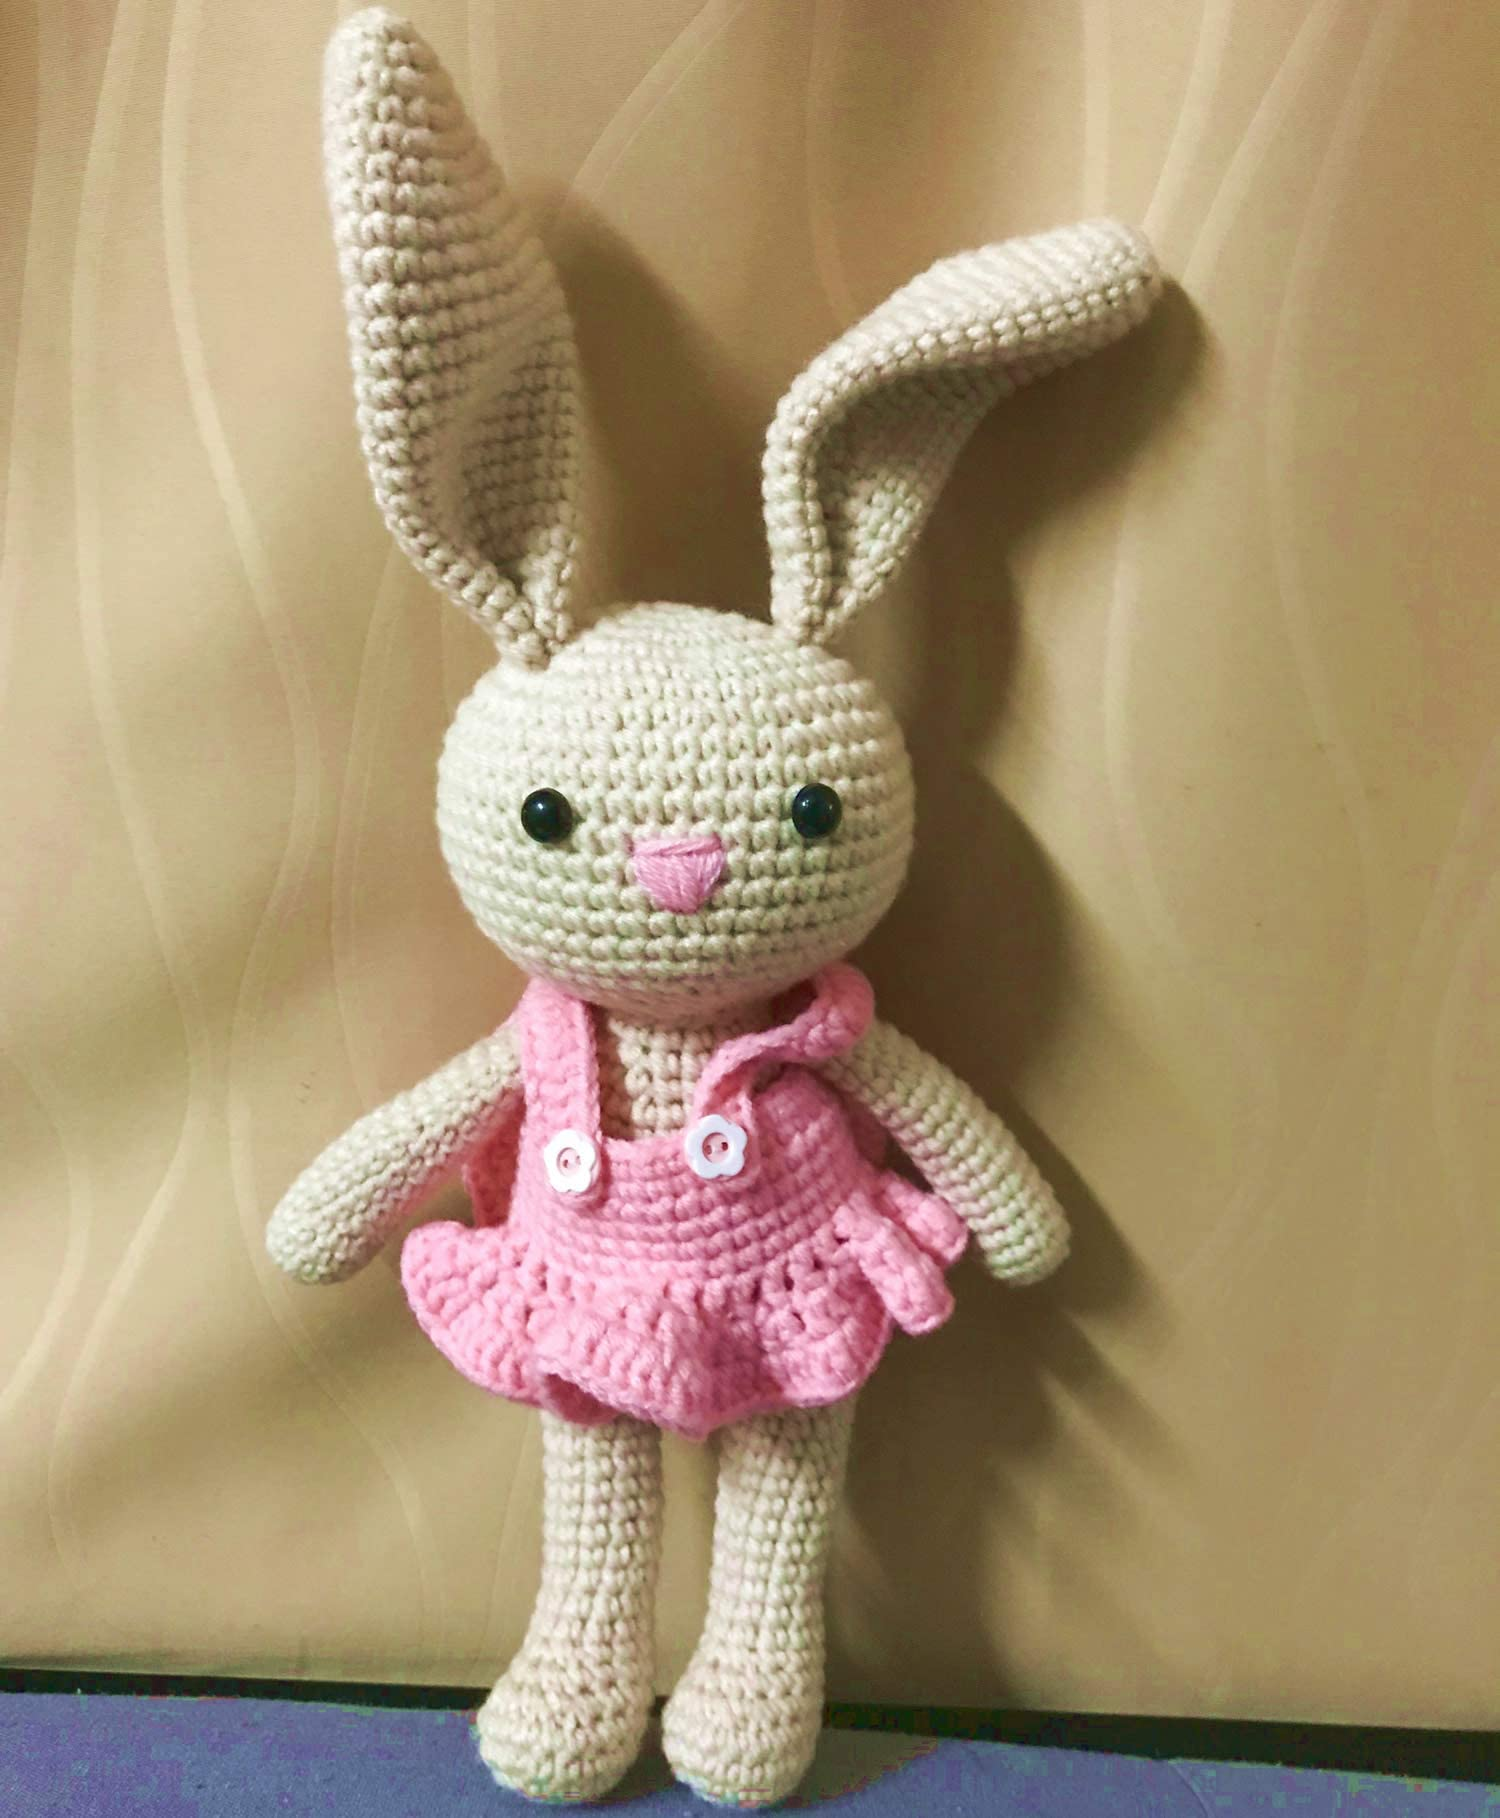 Lilly the Holland Lop Bunny Handmade Crochet Animal Stuffed Animal Crochet Bunny Plush Rabbit Bunny Toy Amigurumi Crochet Bunny